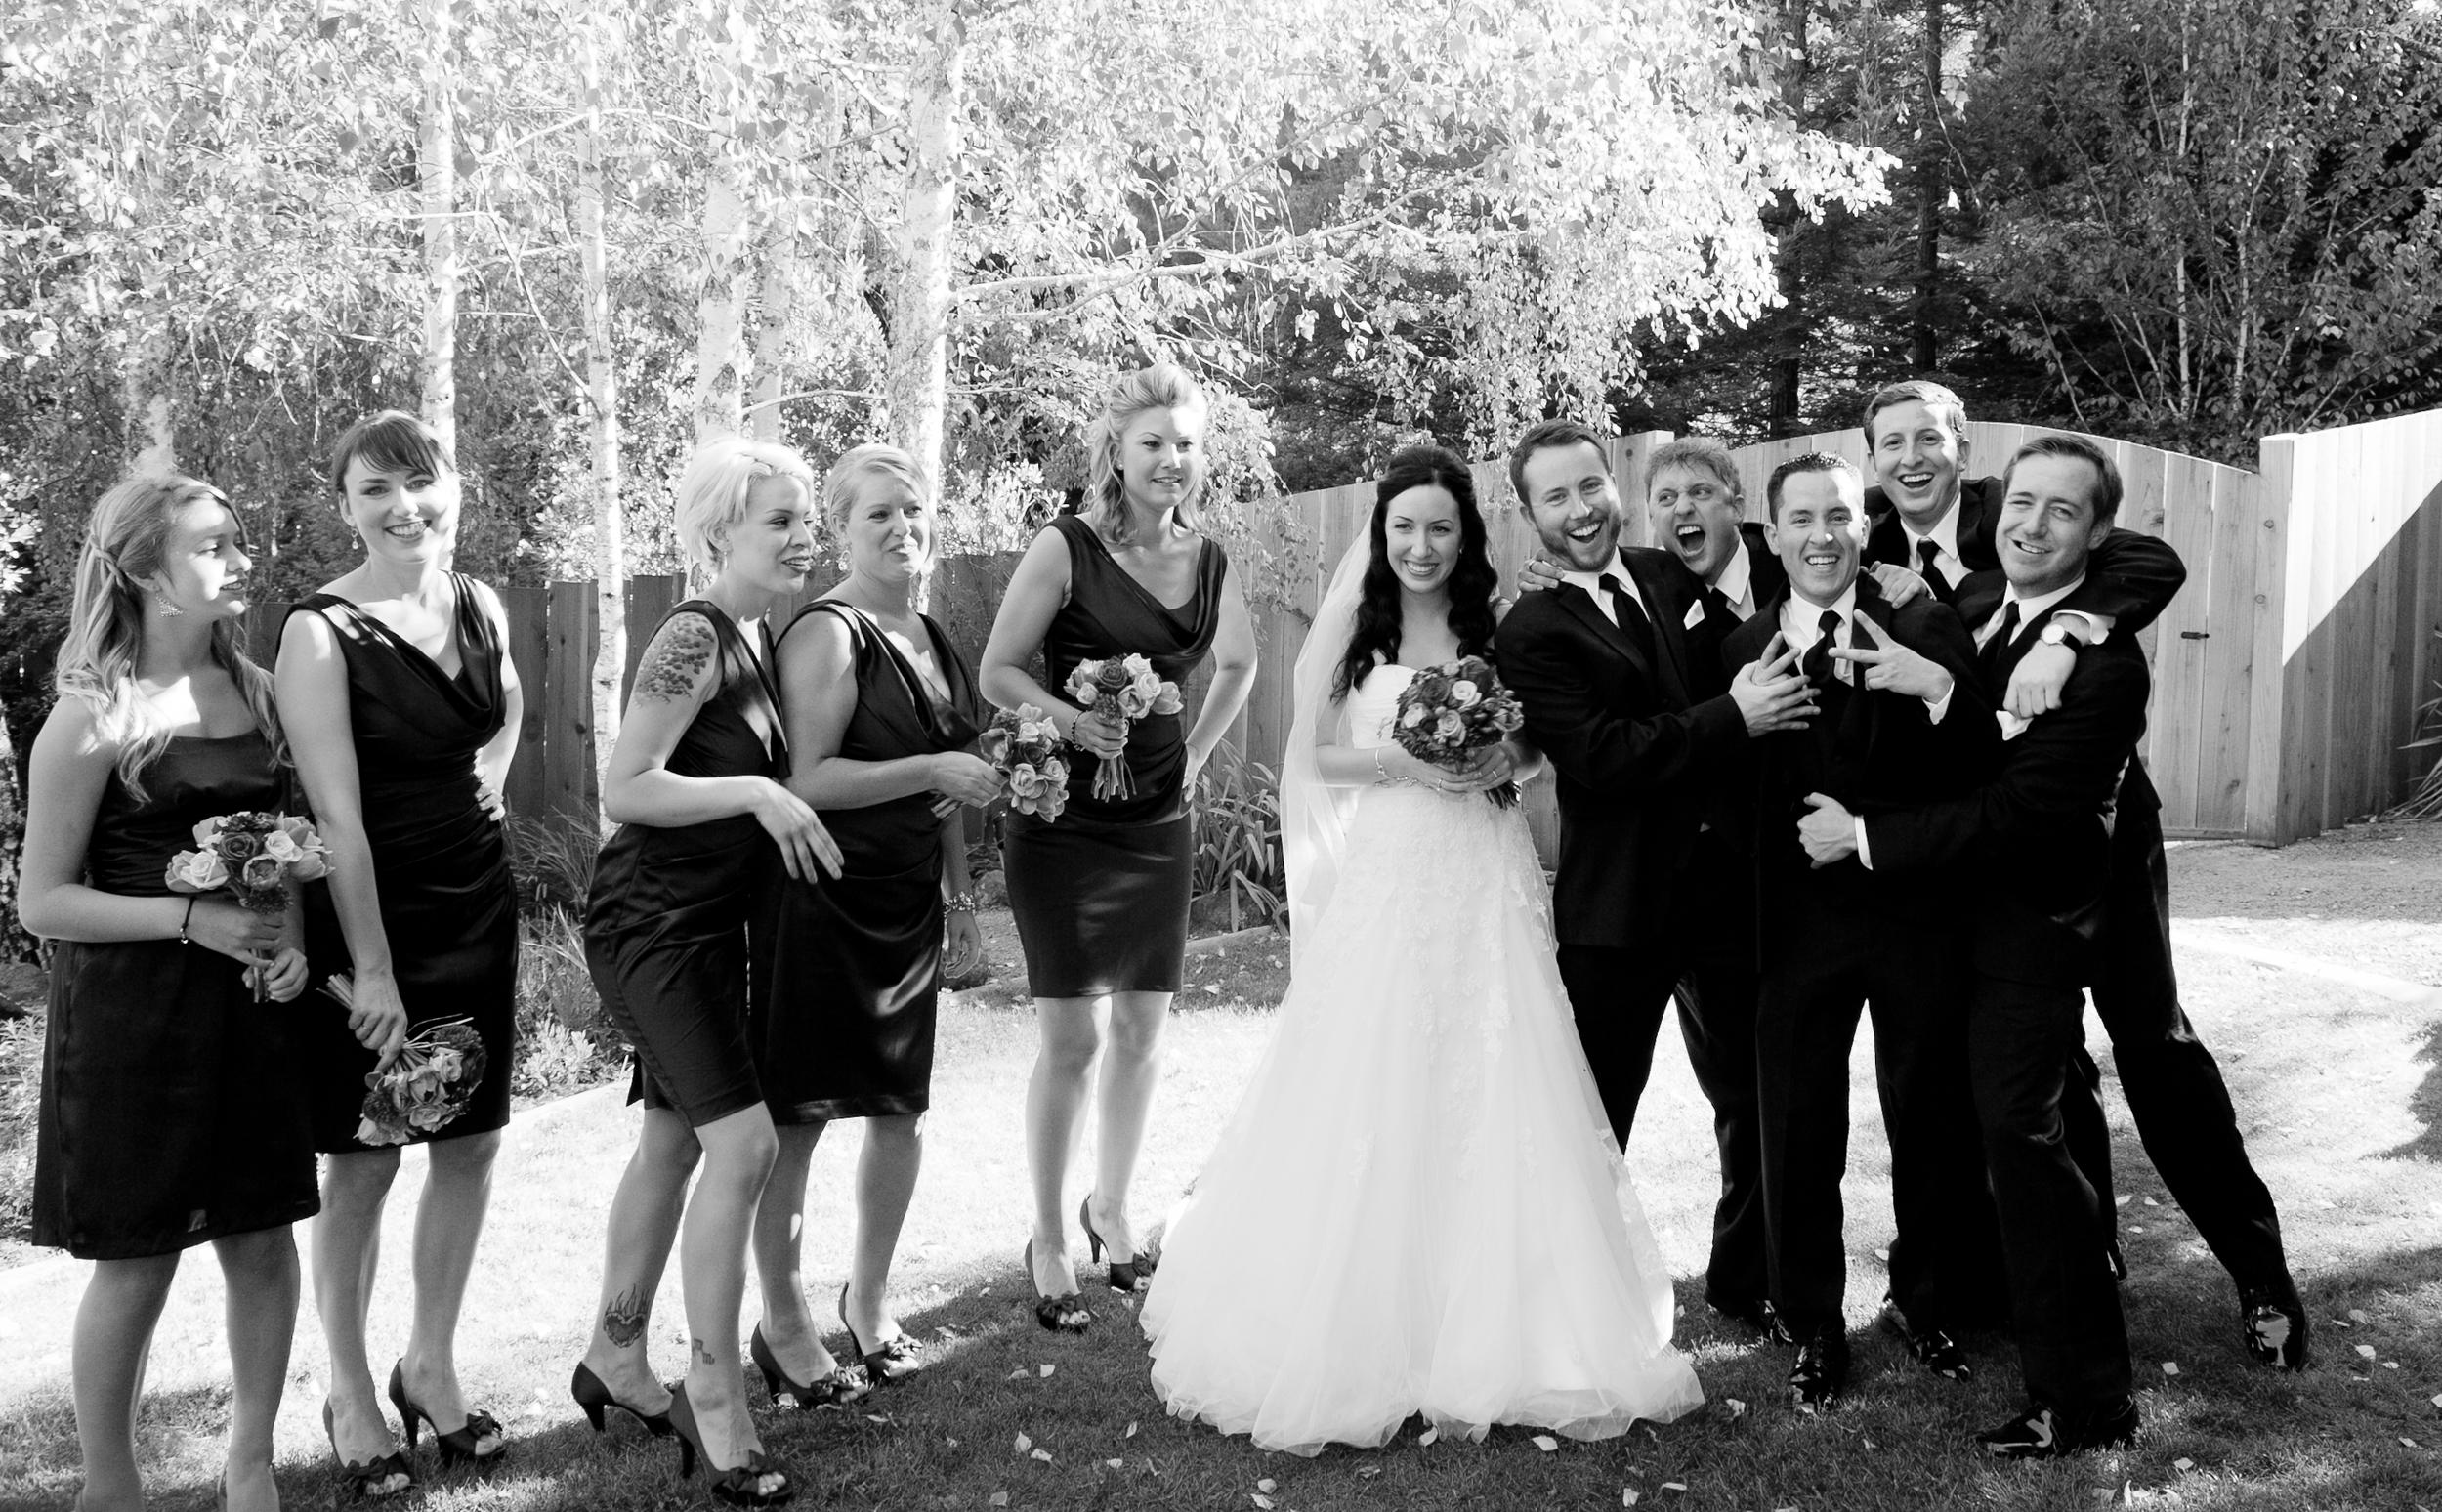 Wedding party at sebastopol wedding